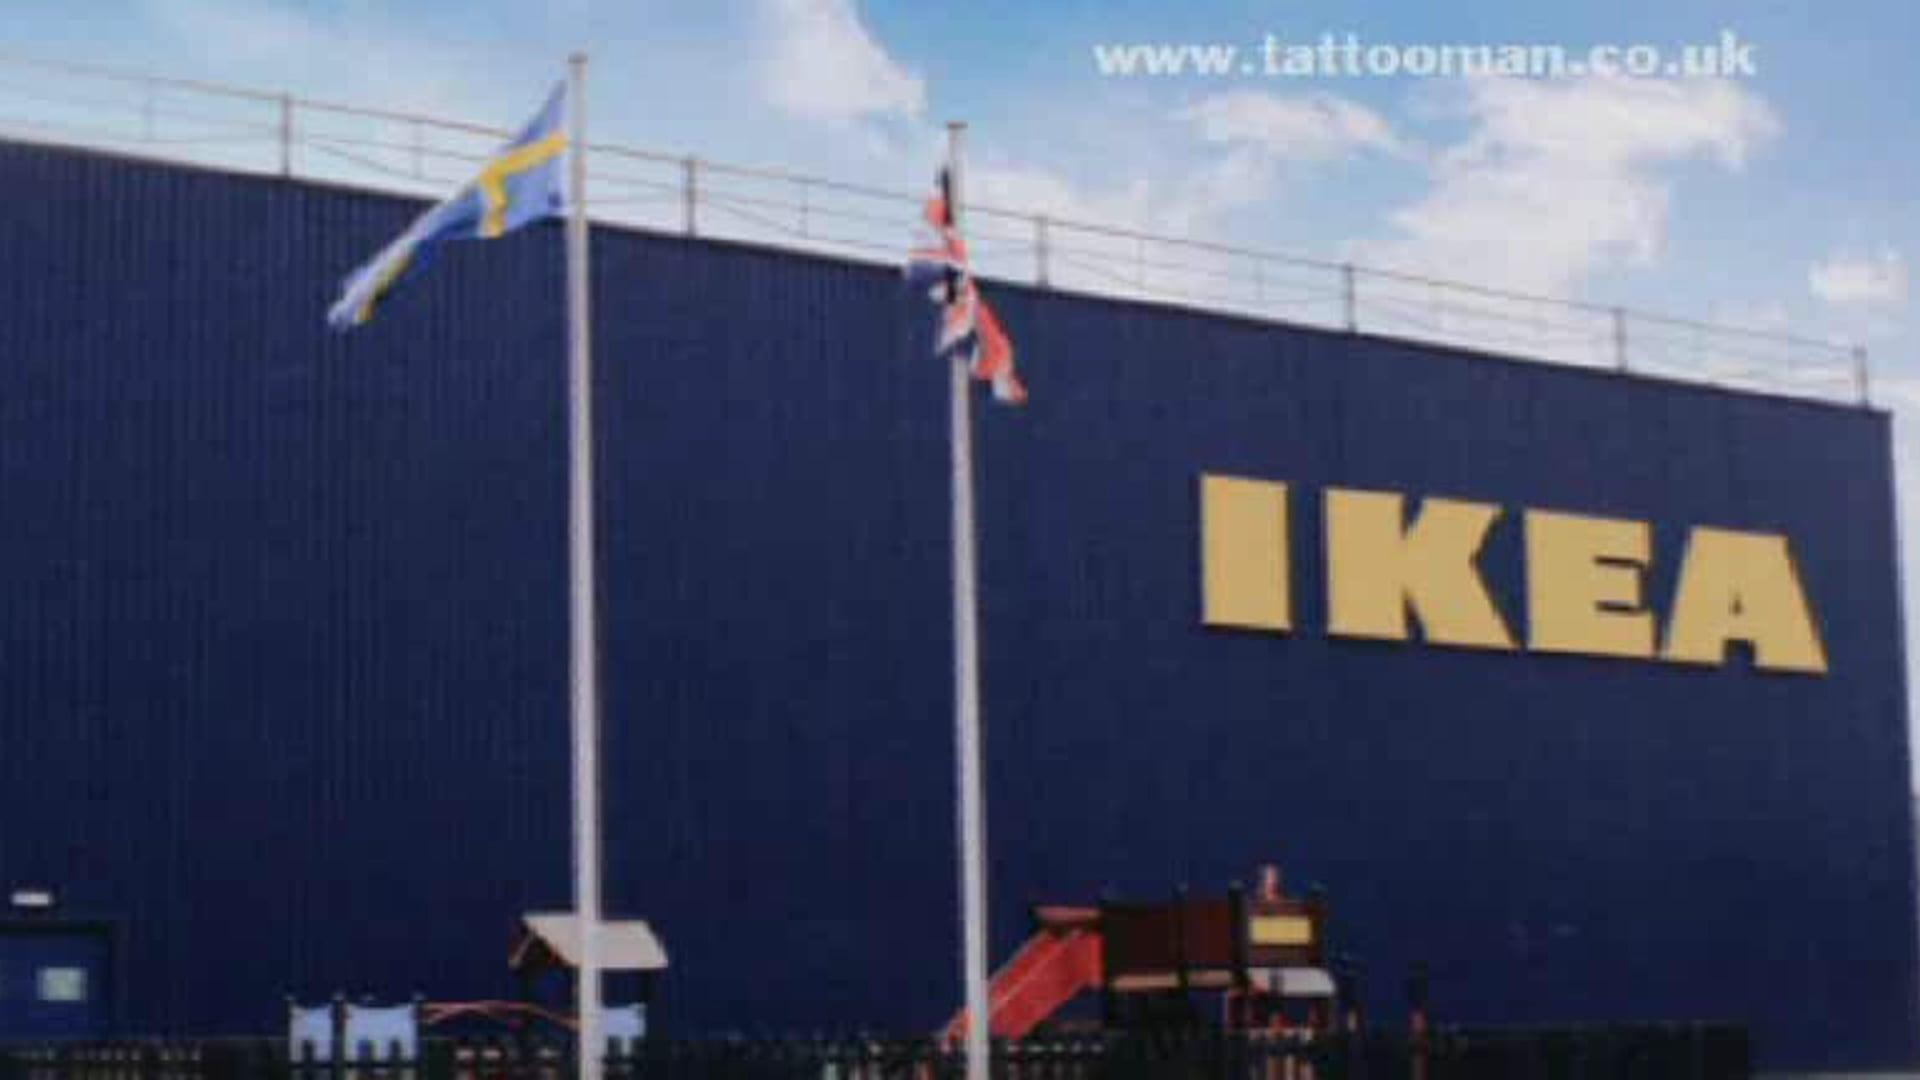 IKEA - Tattoo Man - Waiting 1